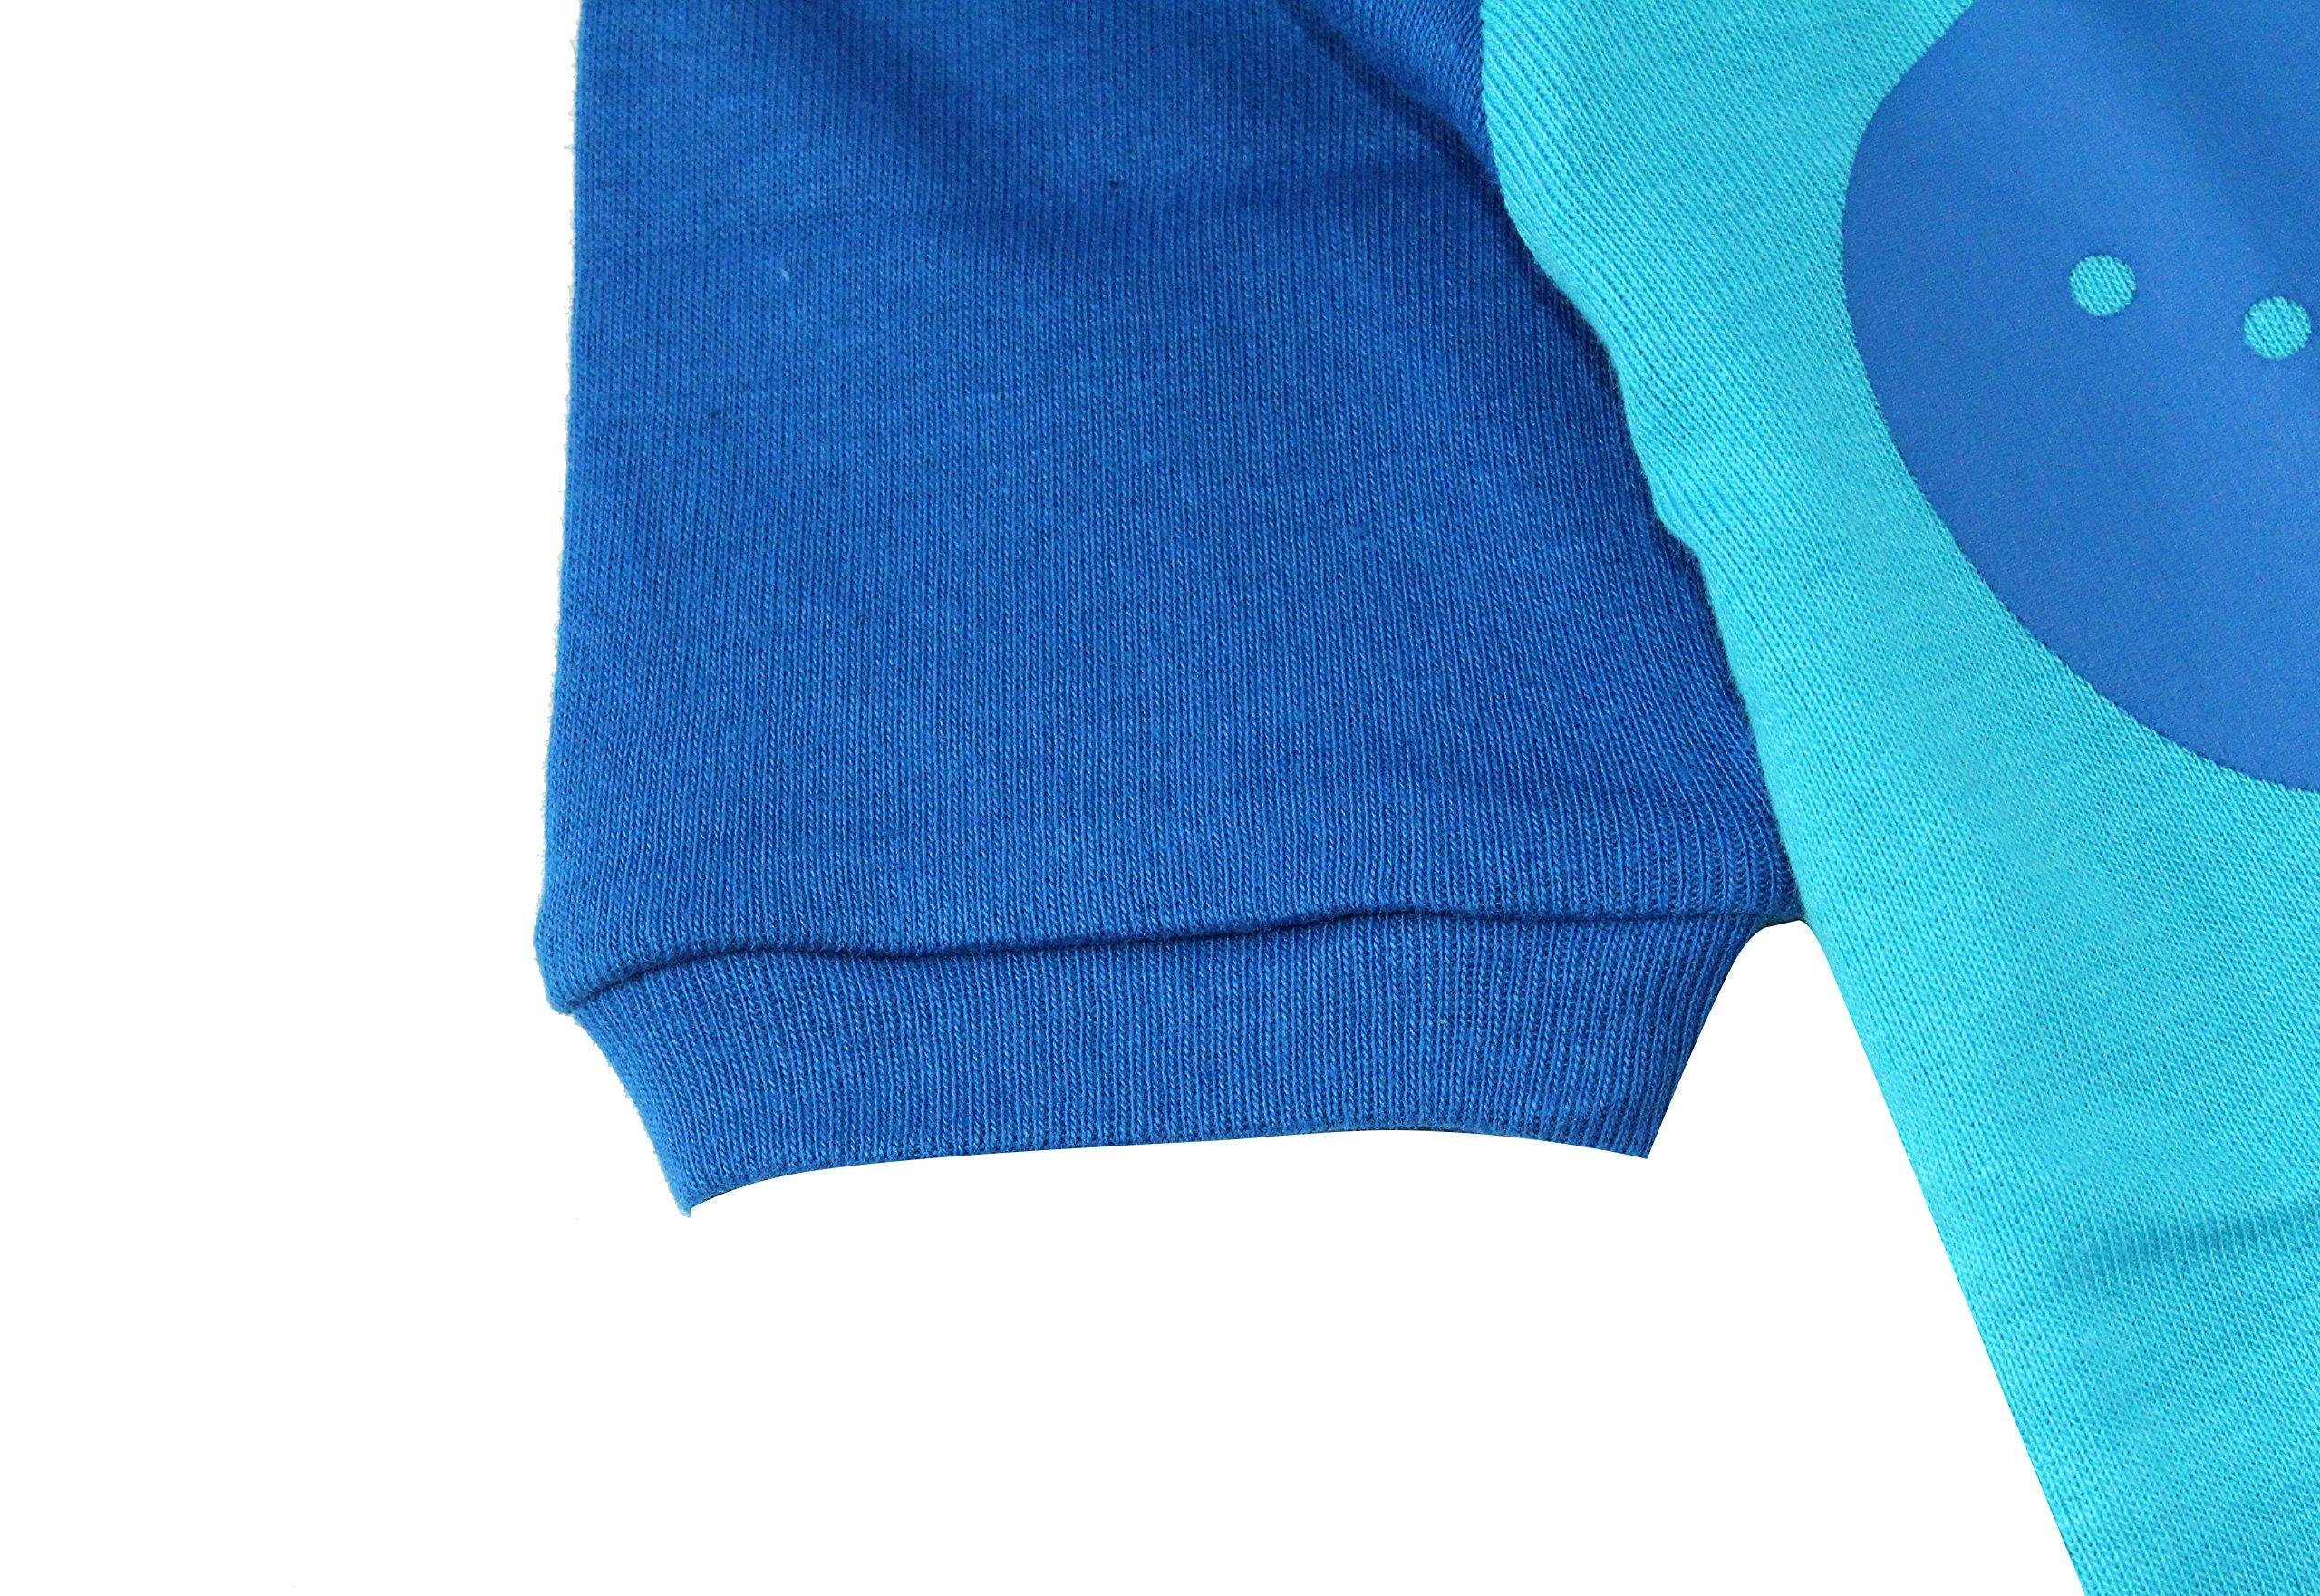 Boys Pajamas Boys Dinosaur Little Kid Shorts Set 100% Cotton Clothes Short Sleeves Sleepwear 8Y by shelry (Image #4)